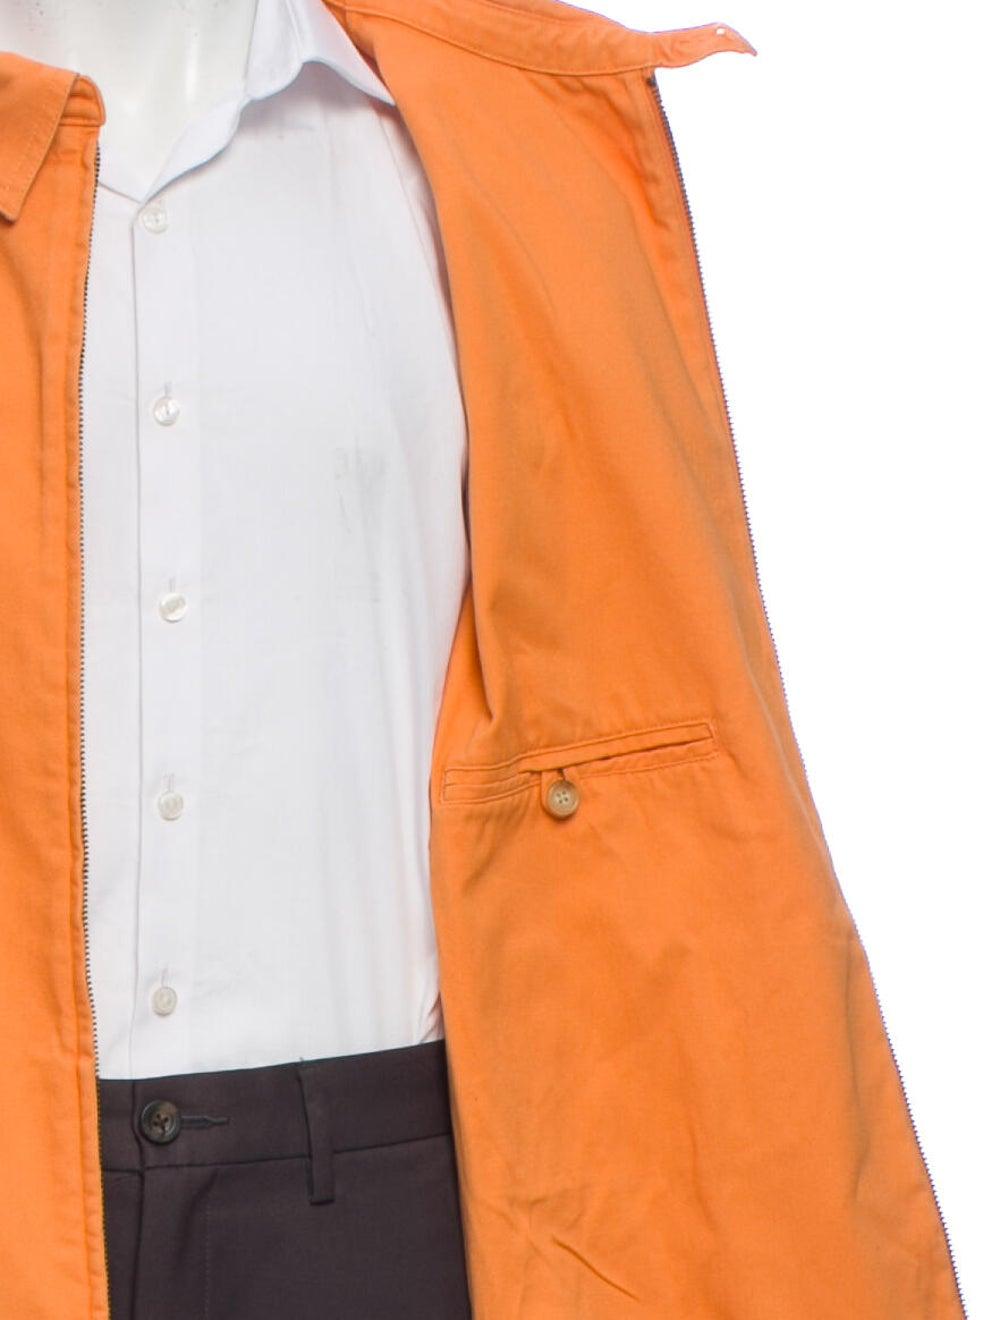 Polo Ralph Lauren Jacket Orange - image 4